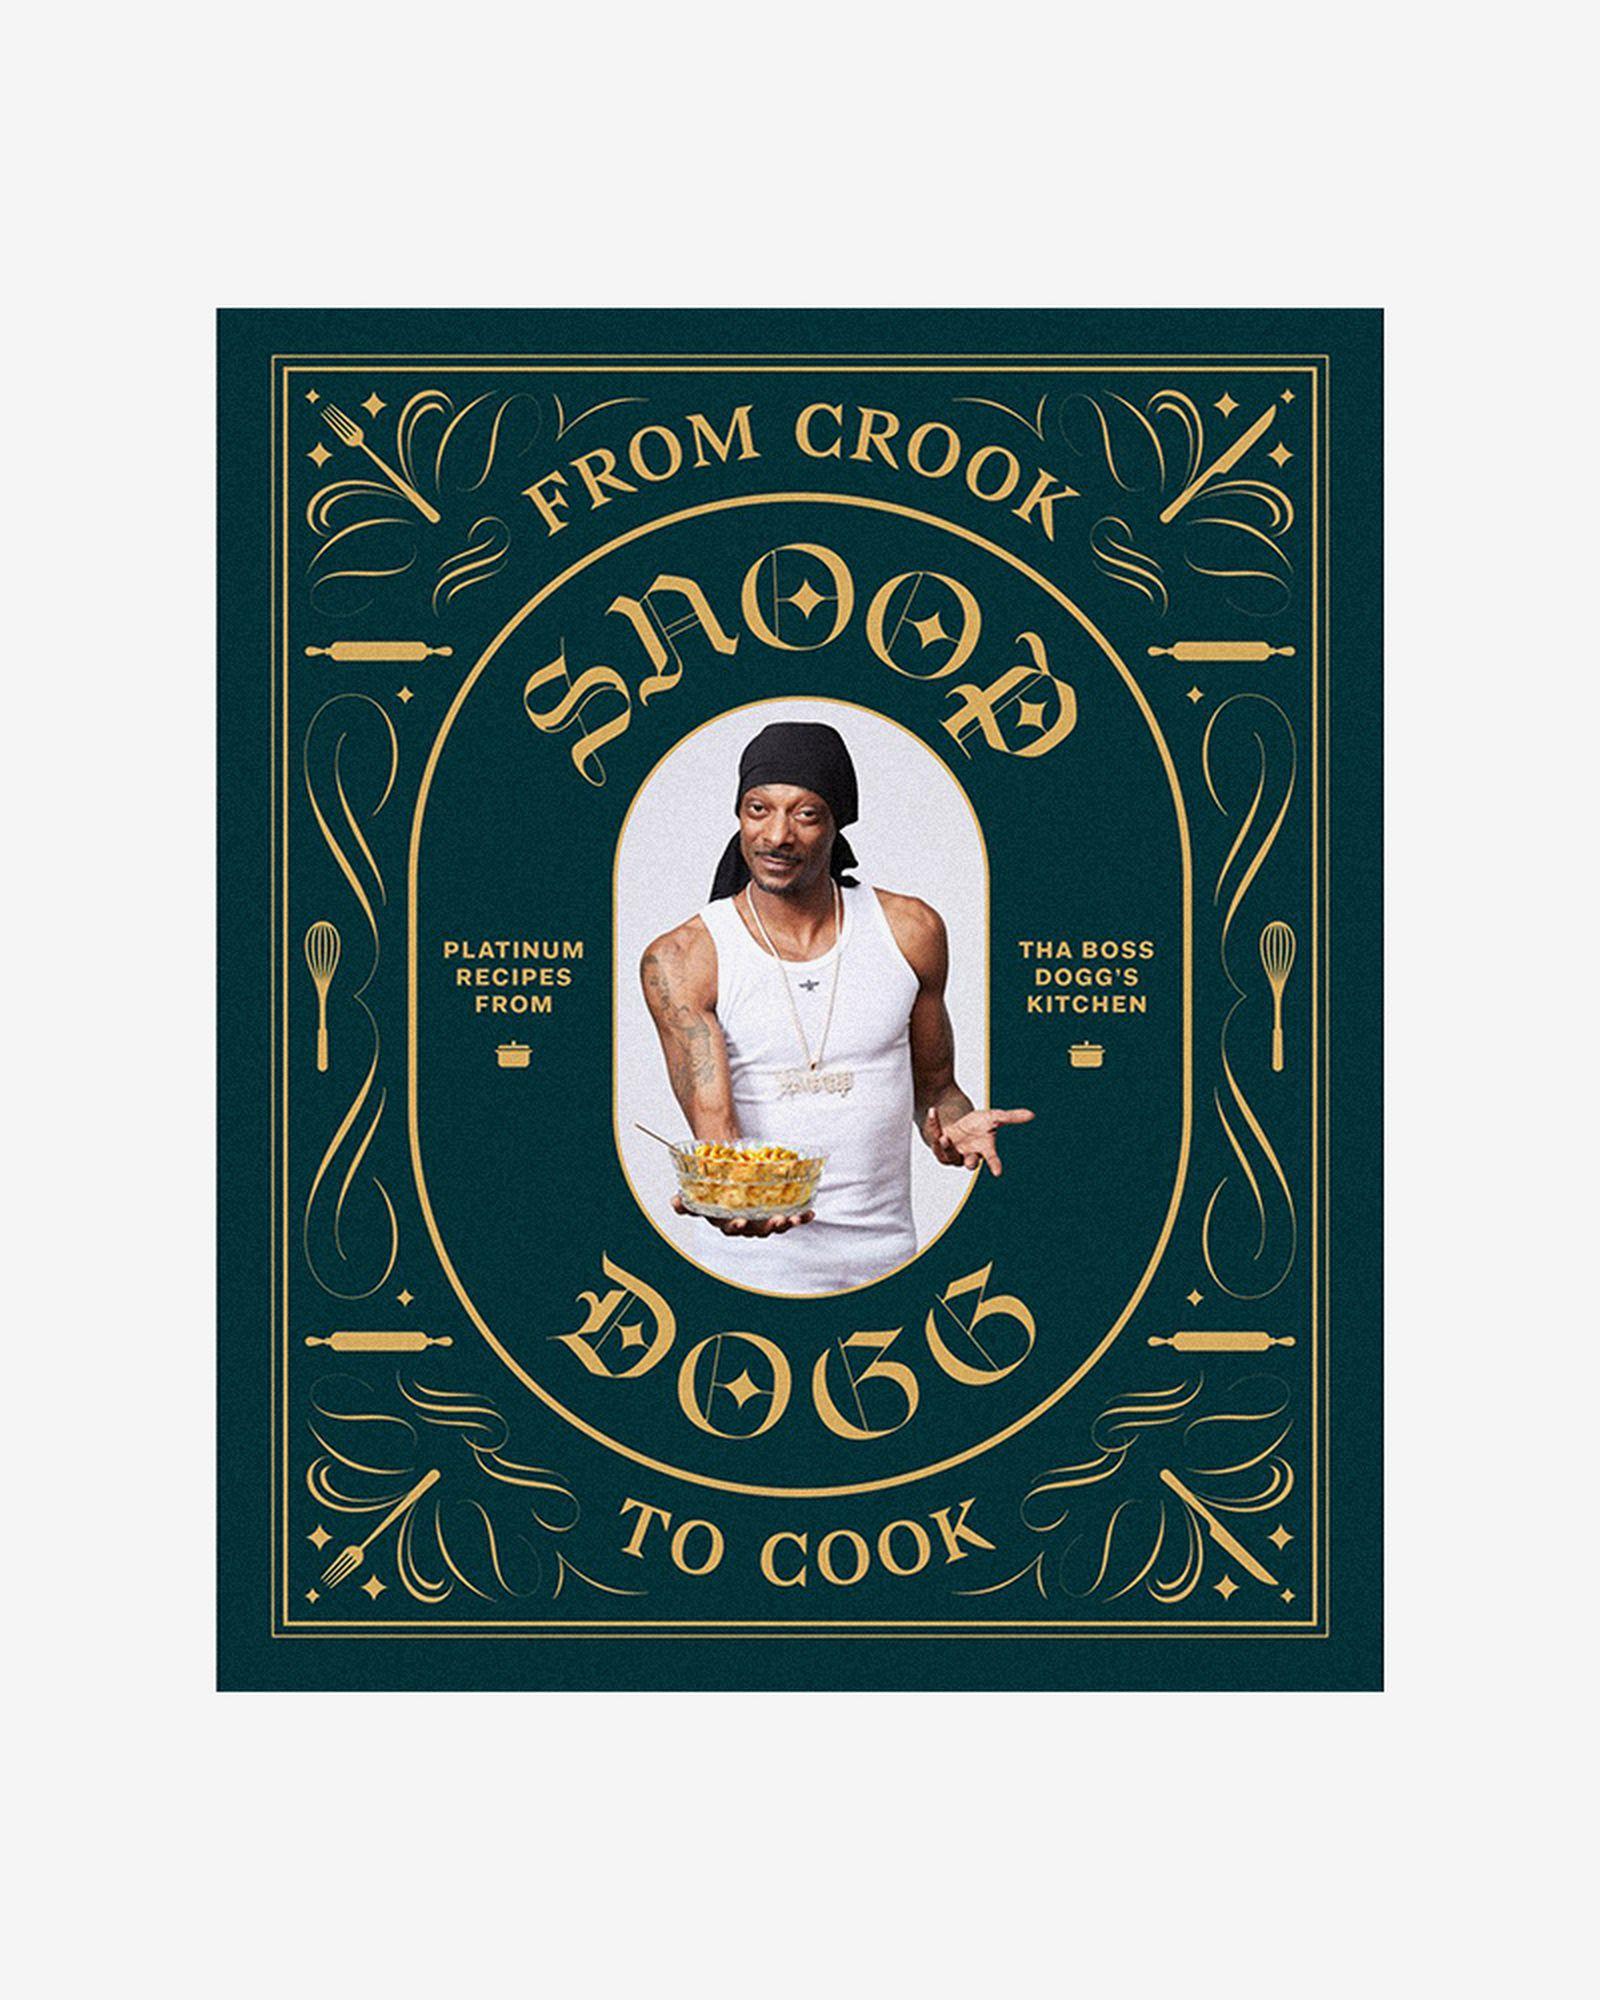 8 rapper cookbooks every hip hop fan needs in their kitchen 2Chainz action bronson questlove